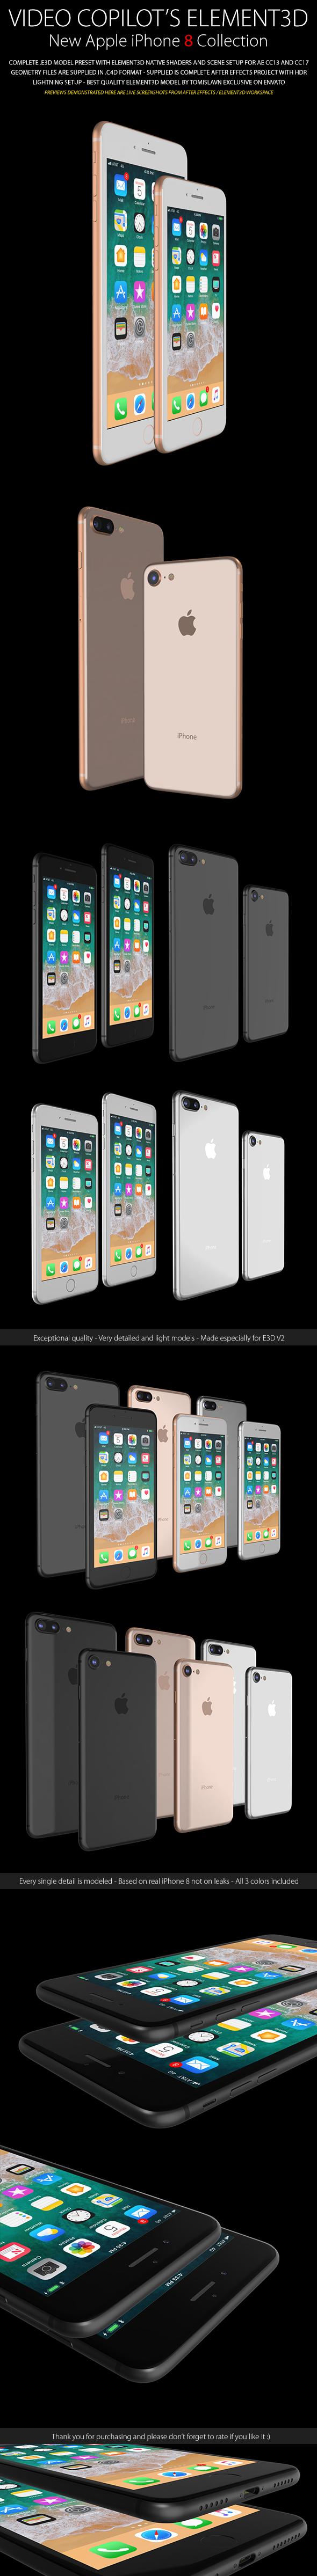 Element3D - iPhone 8 / 8 Plus Collection